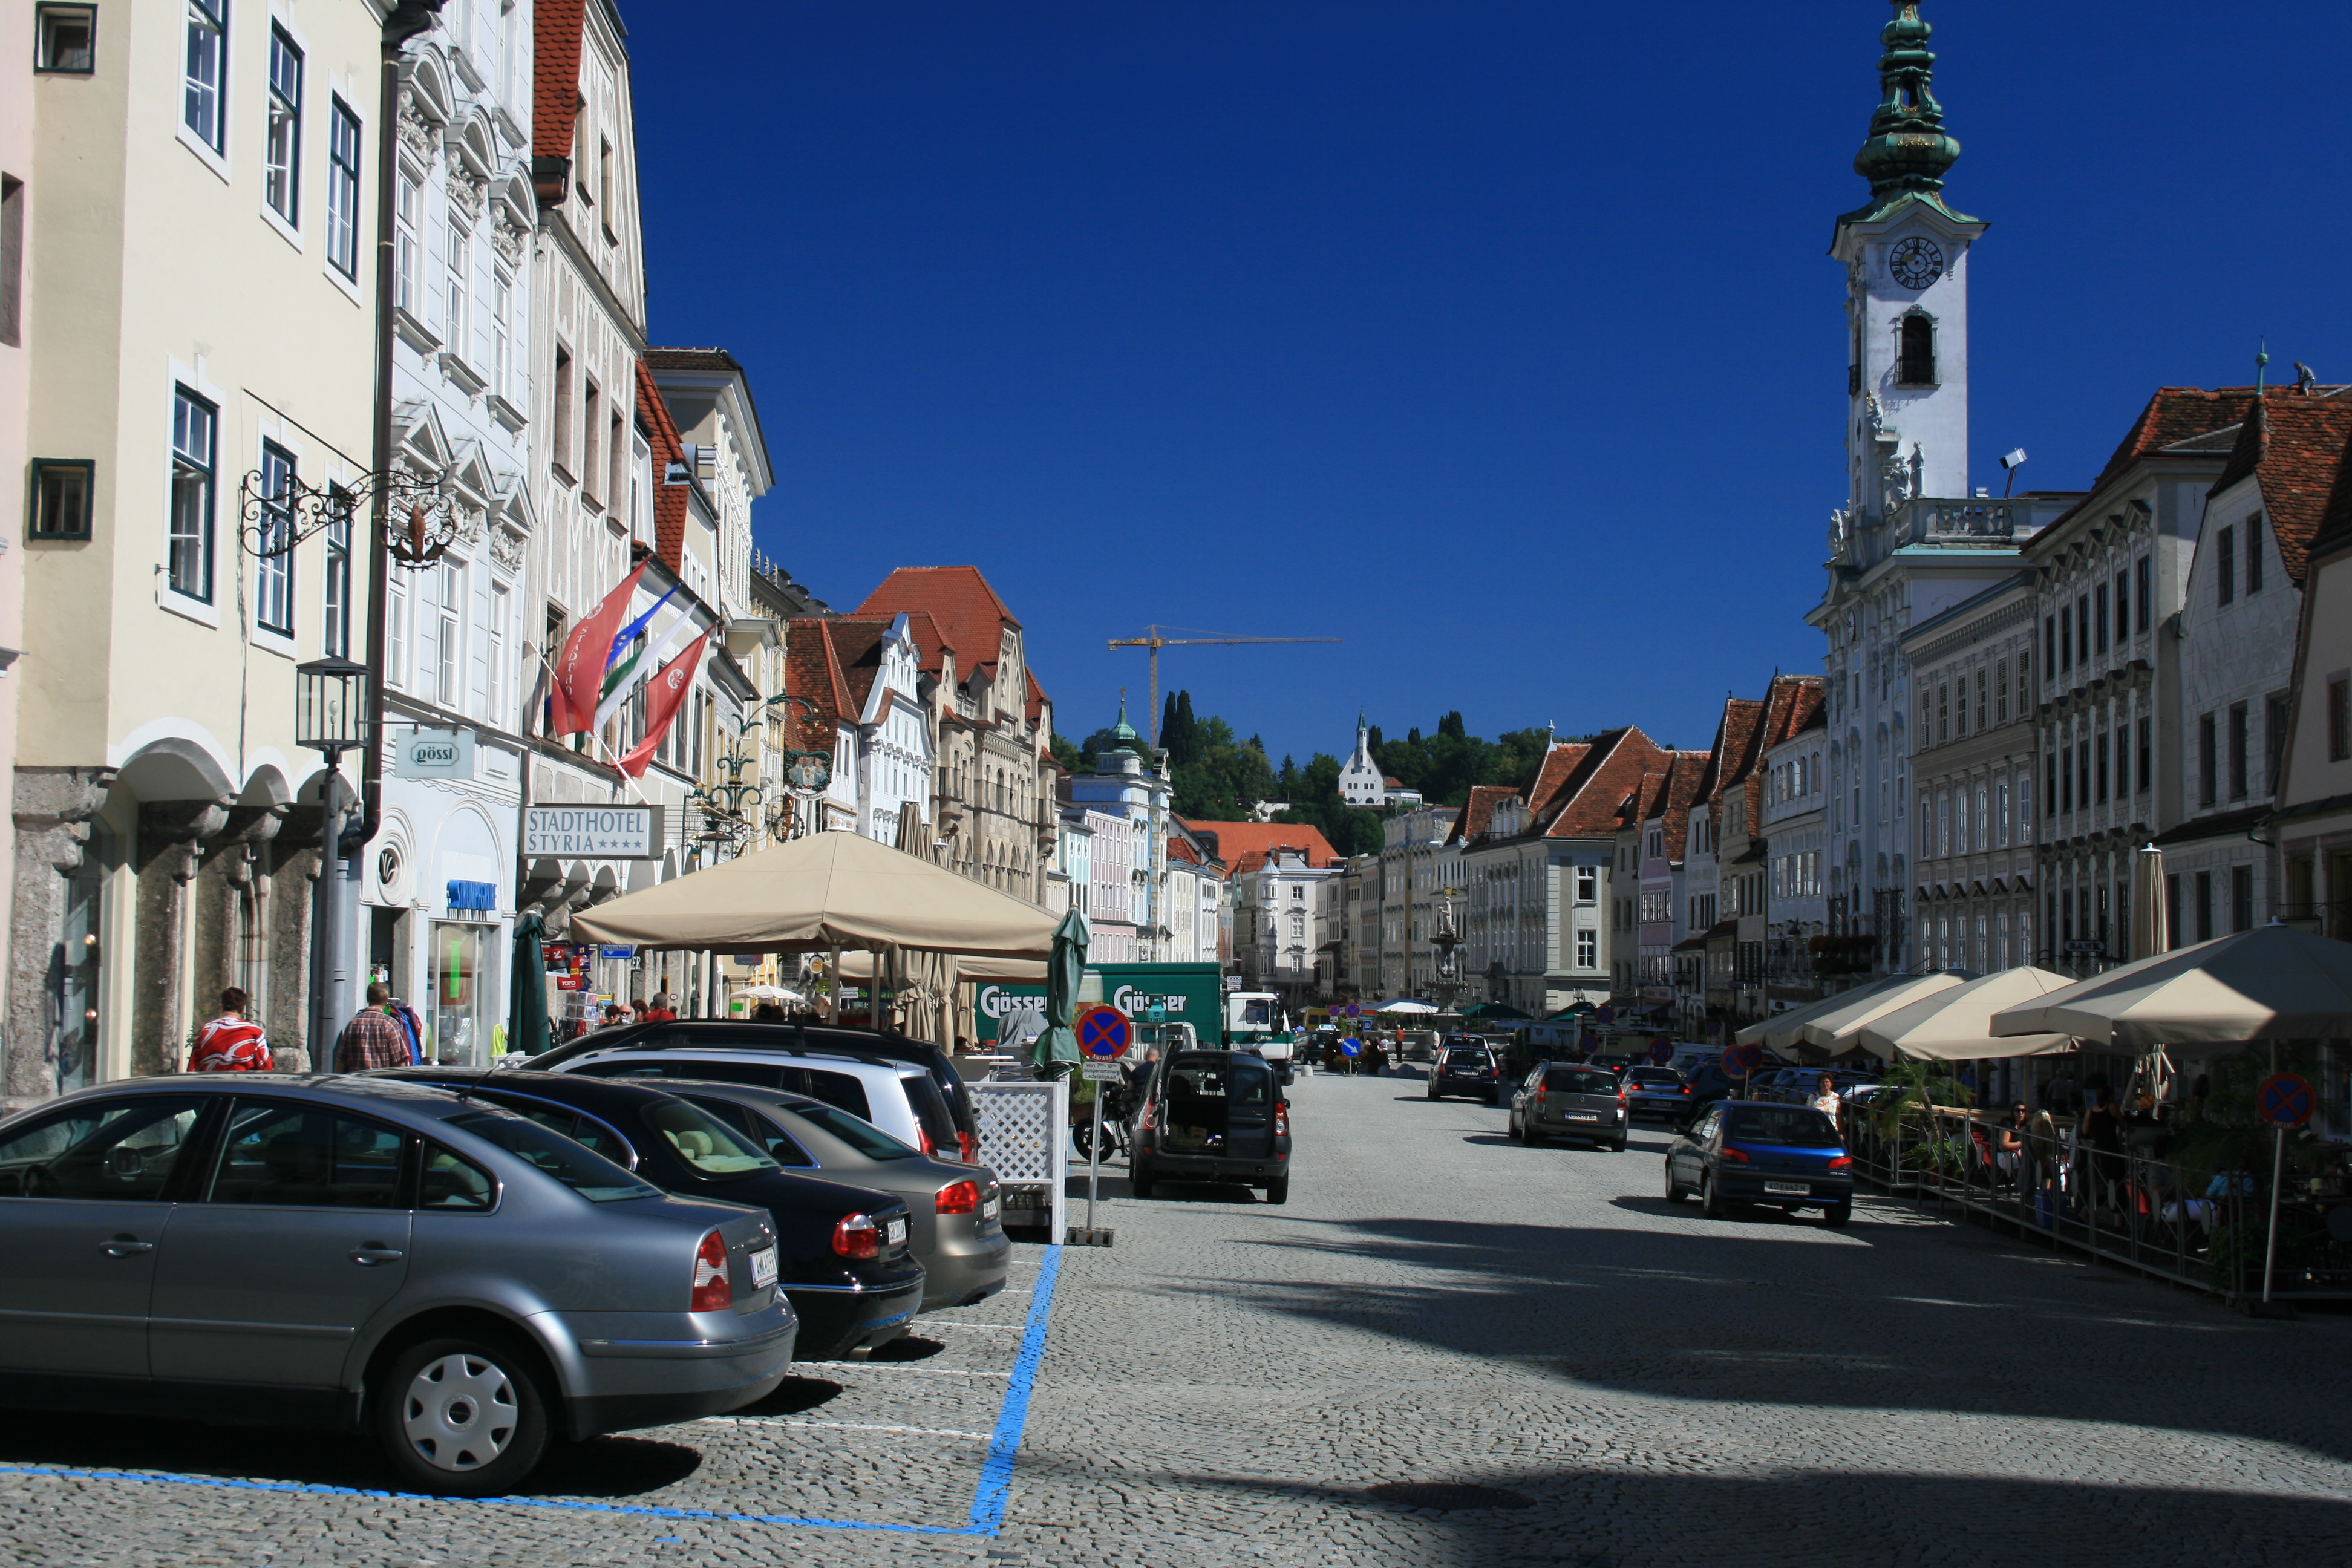 Steyrer_Stadtplatz.jpg